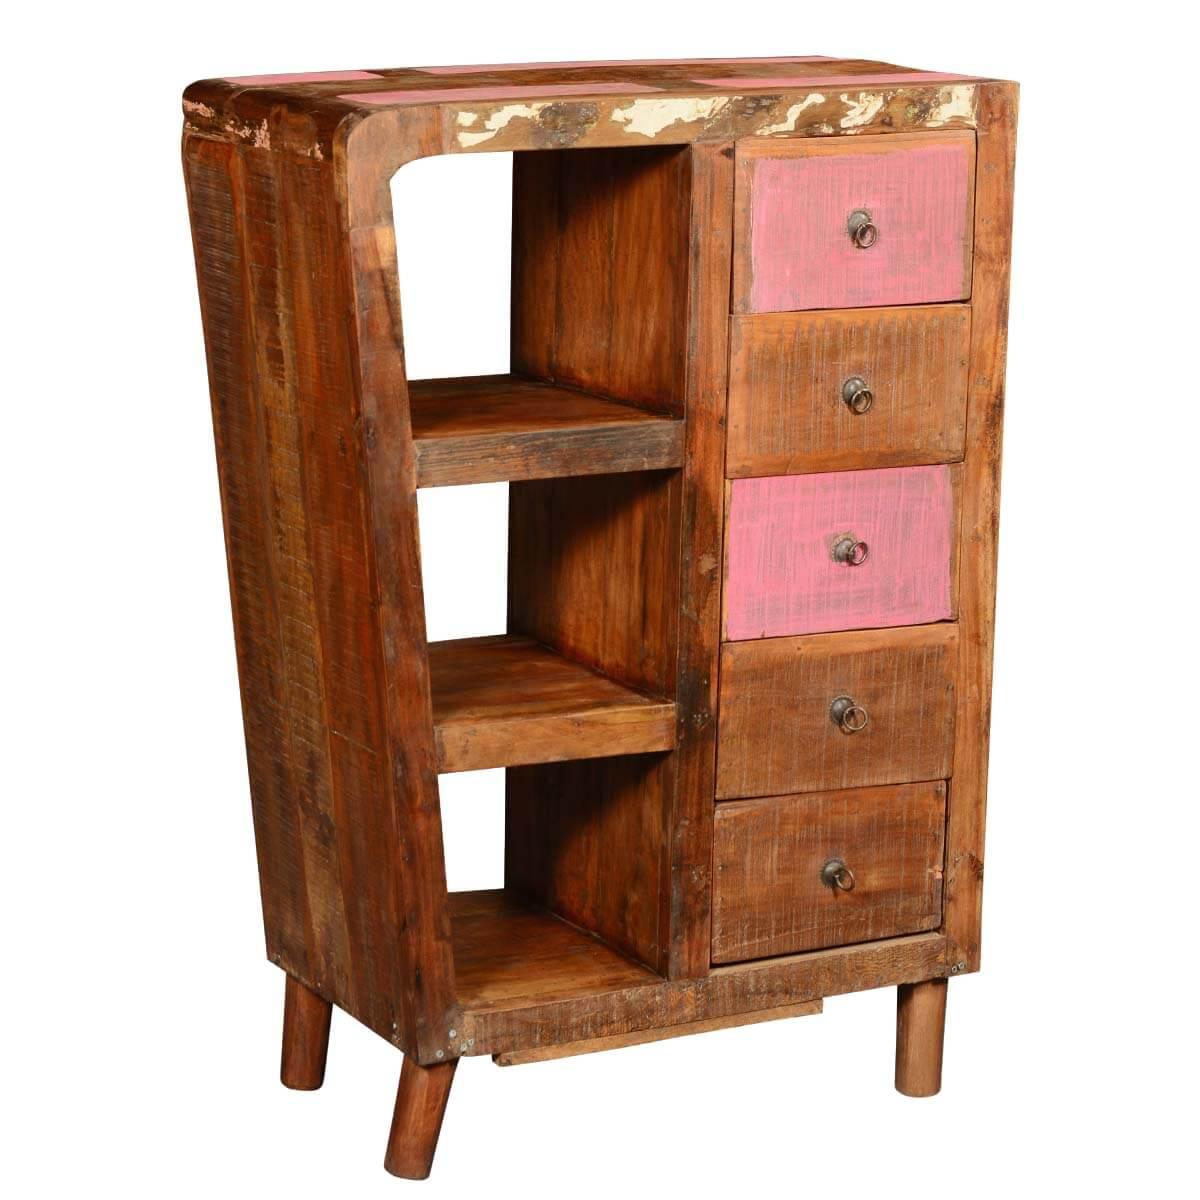 Rustic Reclaimed Wood 5 Drawer Storage Cabinet w Display